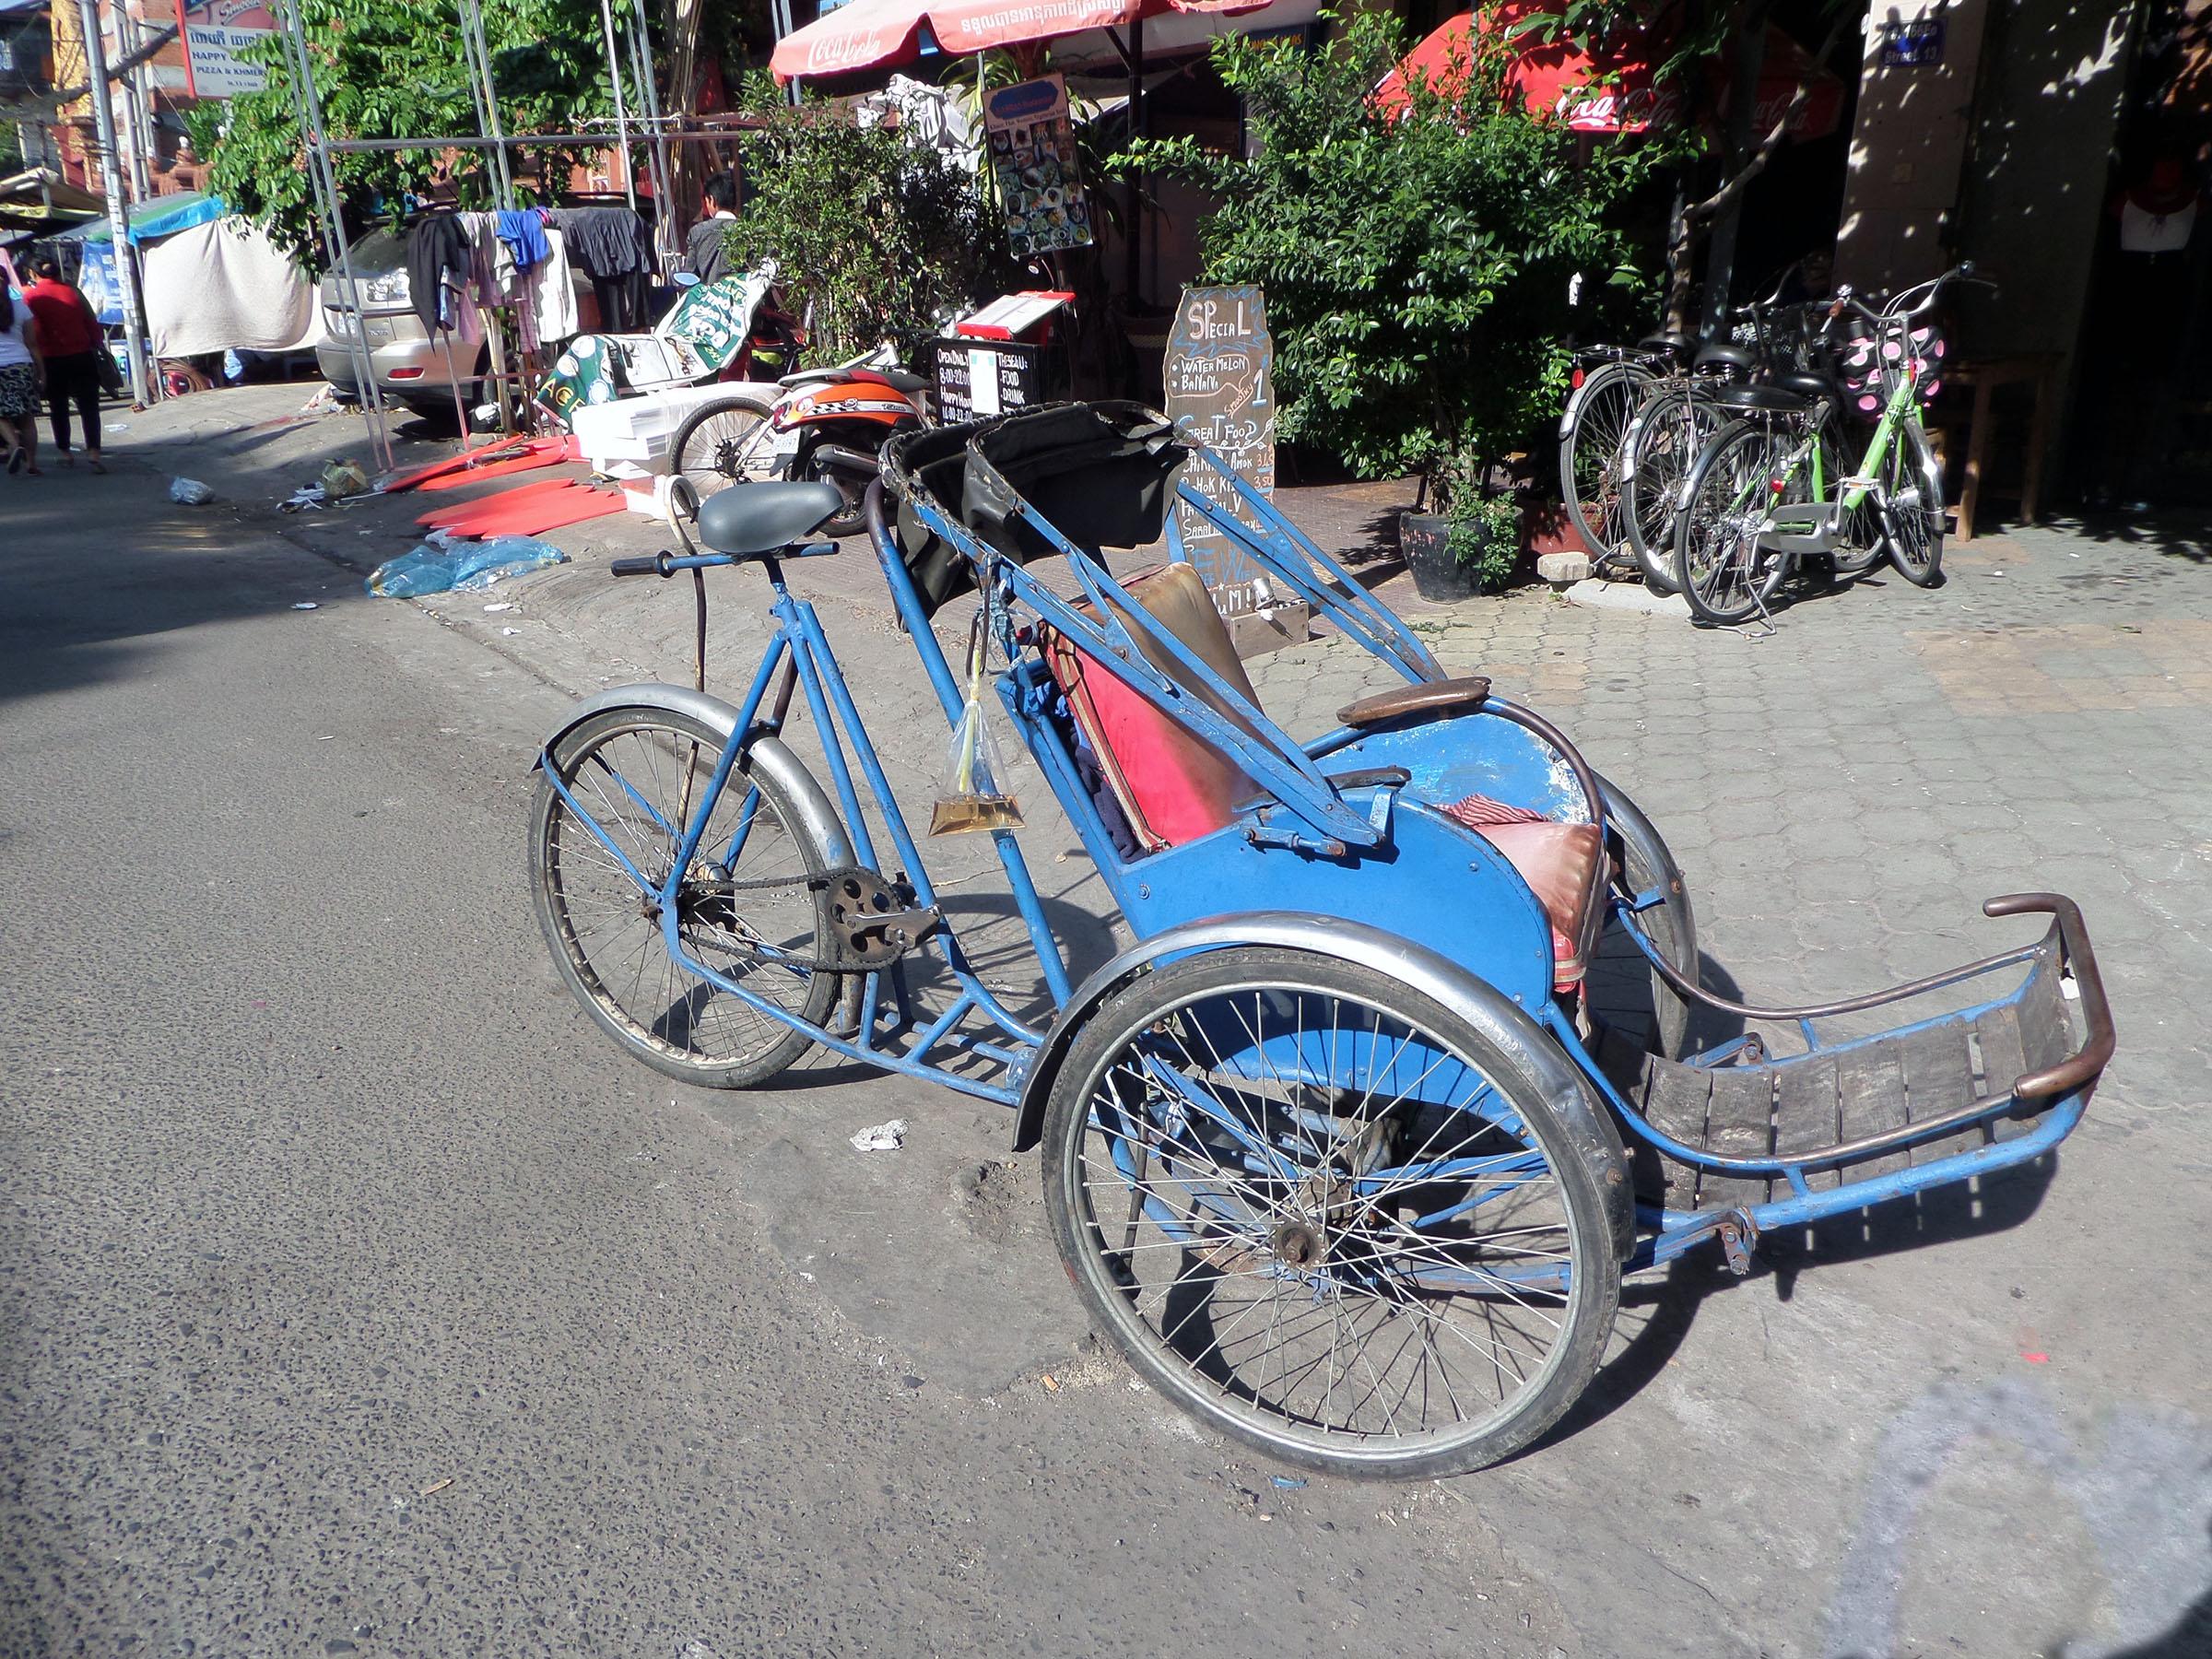 Cambodian cyclo, Cambodia, City, Cycle, Cyclo, HQ Photo